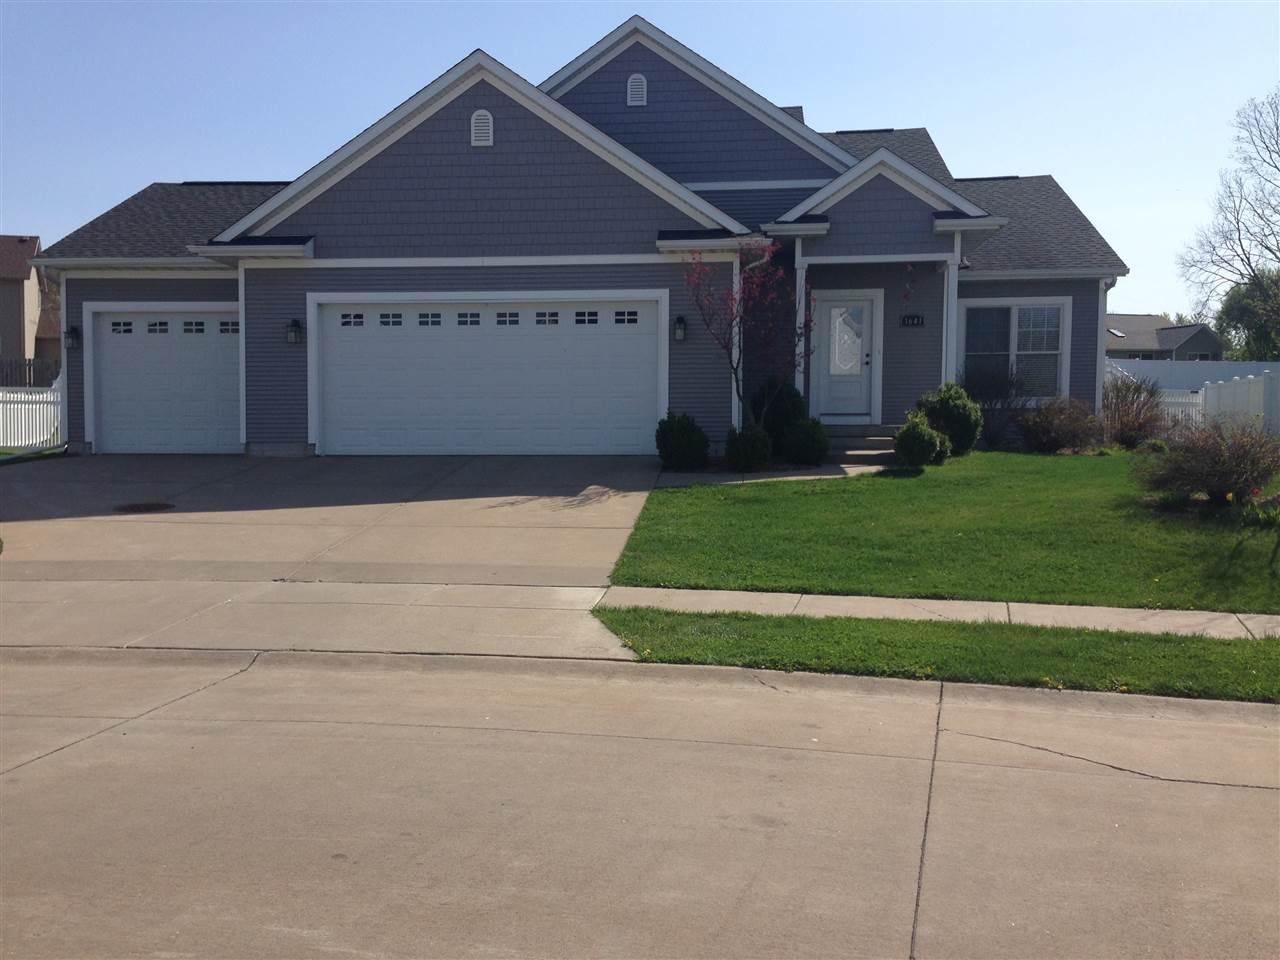 Real Estate for Sale, ListingId: 33043129, Davenport,IA52806